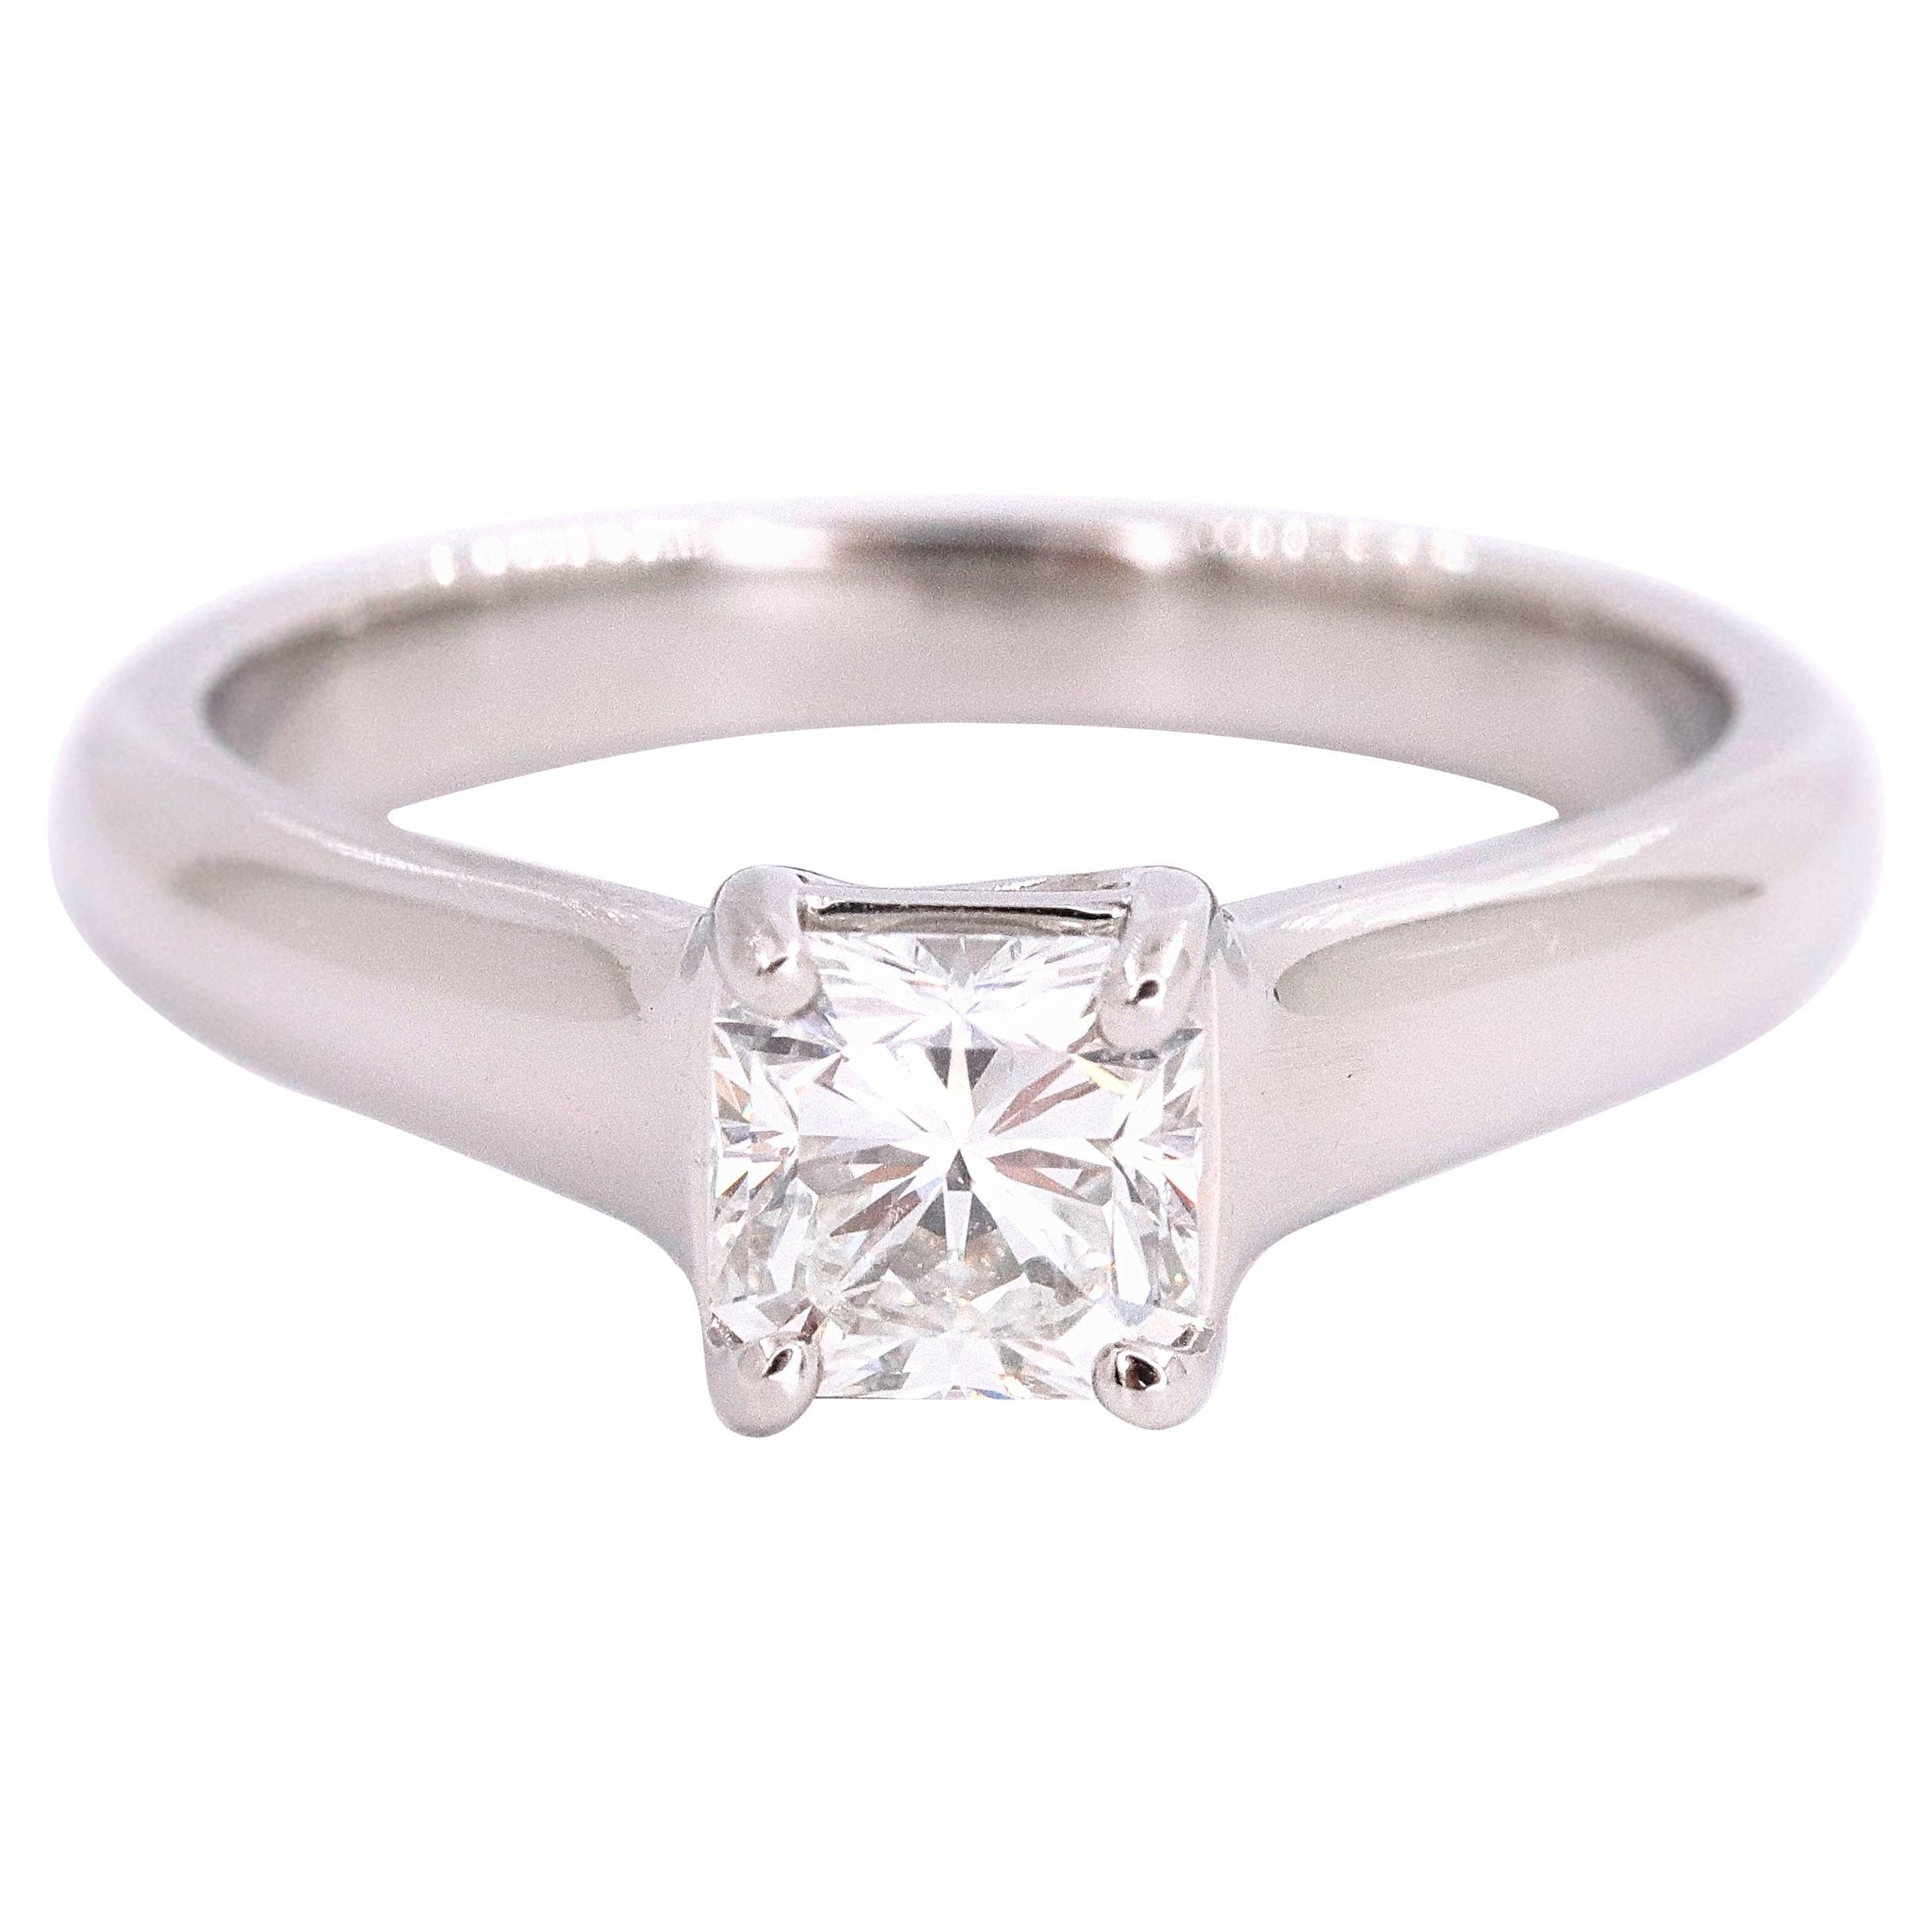 Tiffany & Co. Lucida Diamond 0.56 Carat Engagement Ring Platinum